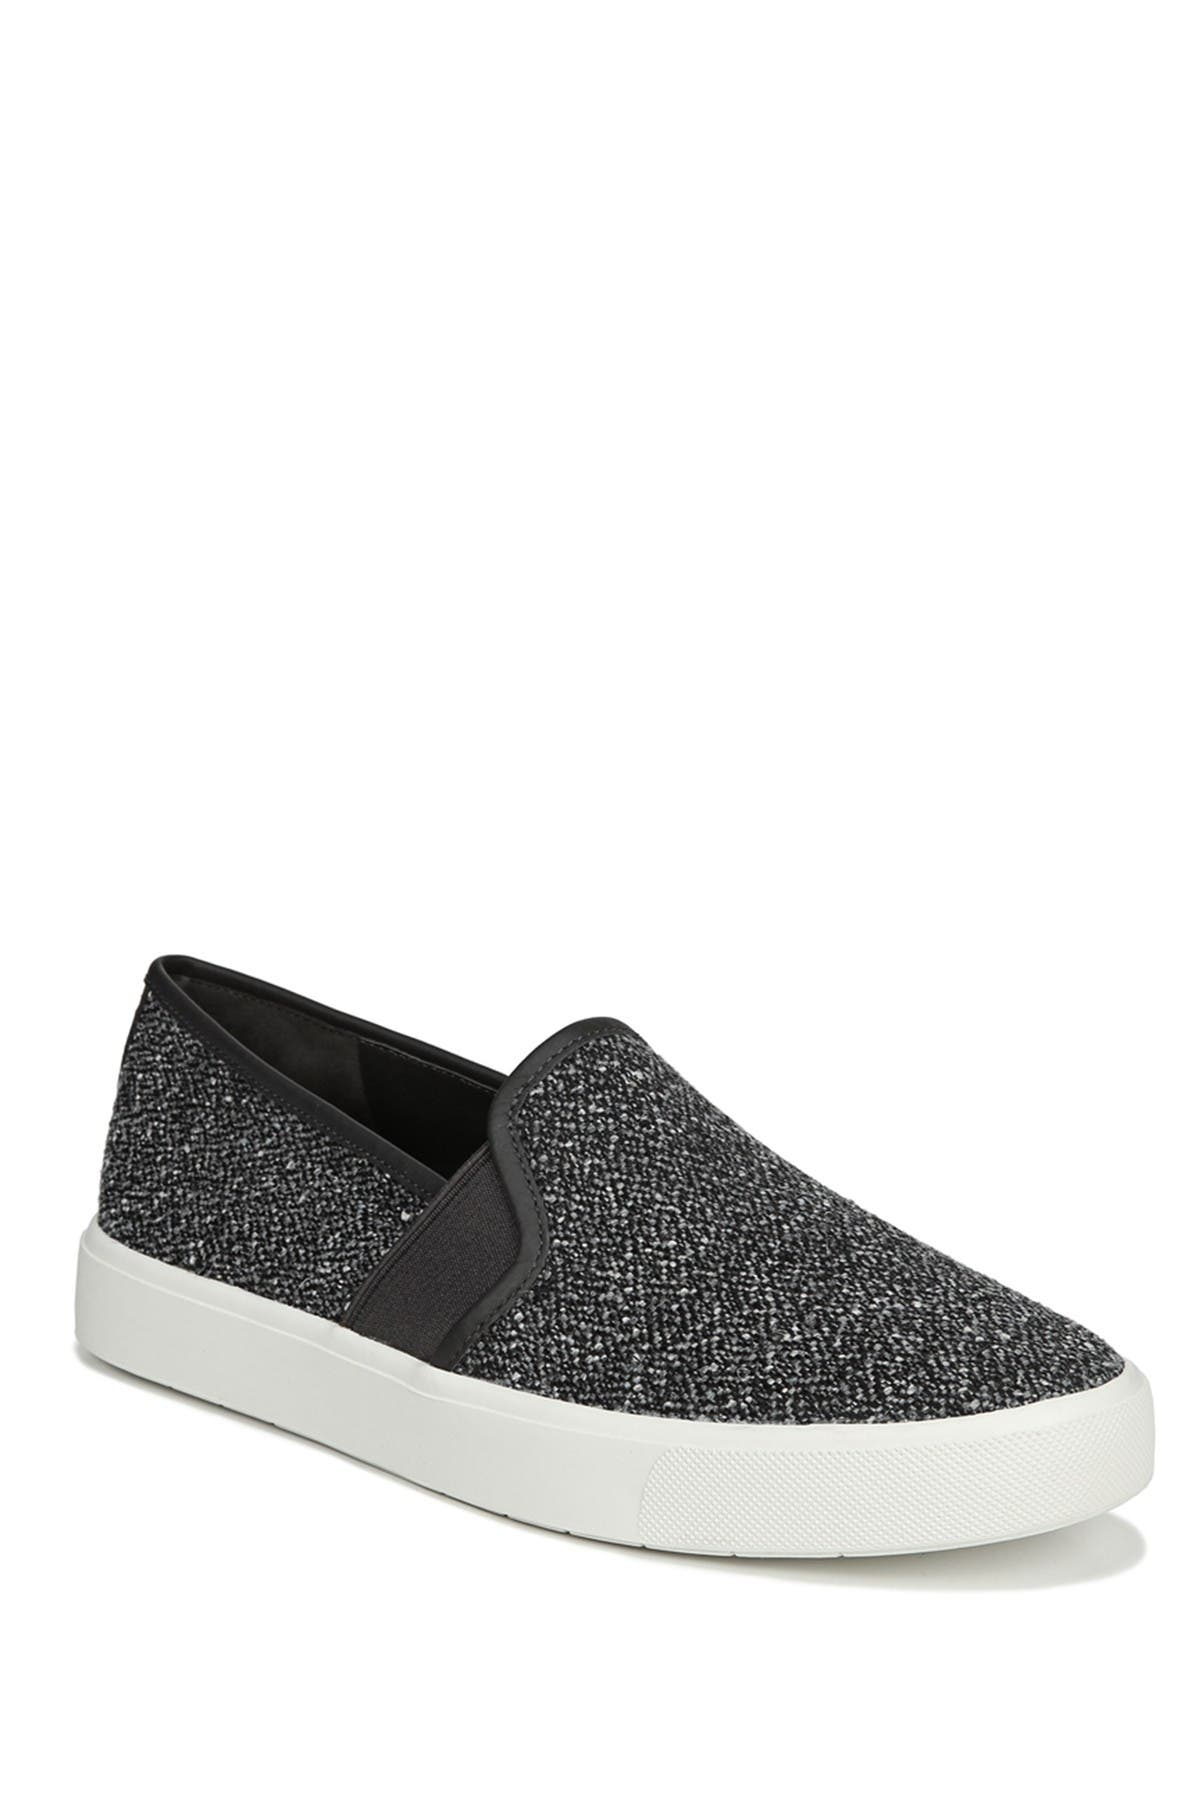 Image of Vince Blair Slip-On Sneaker